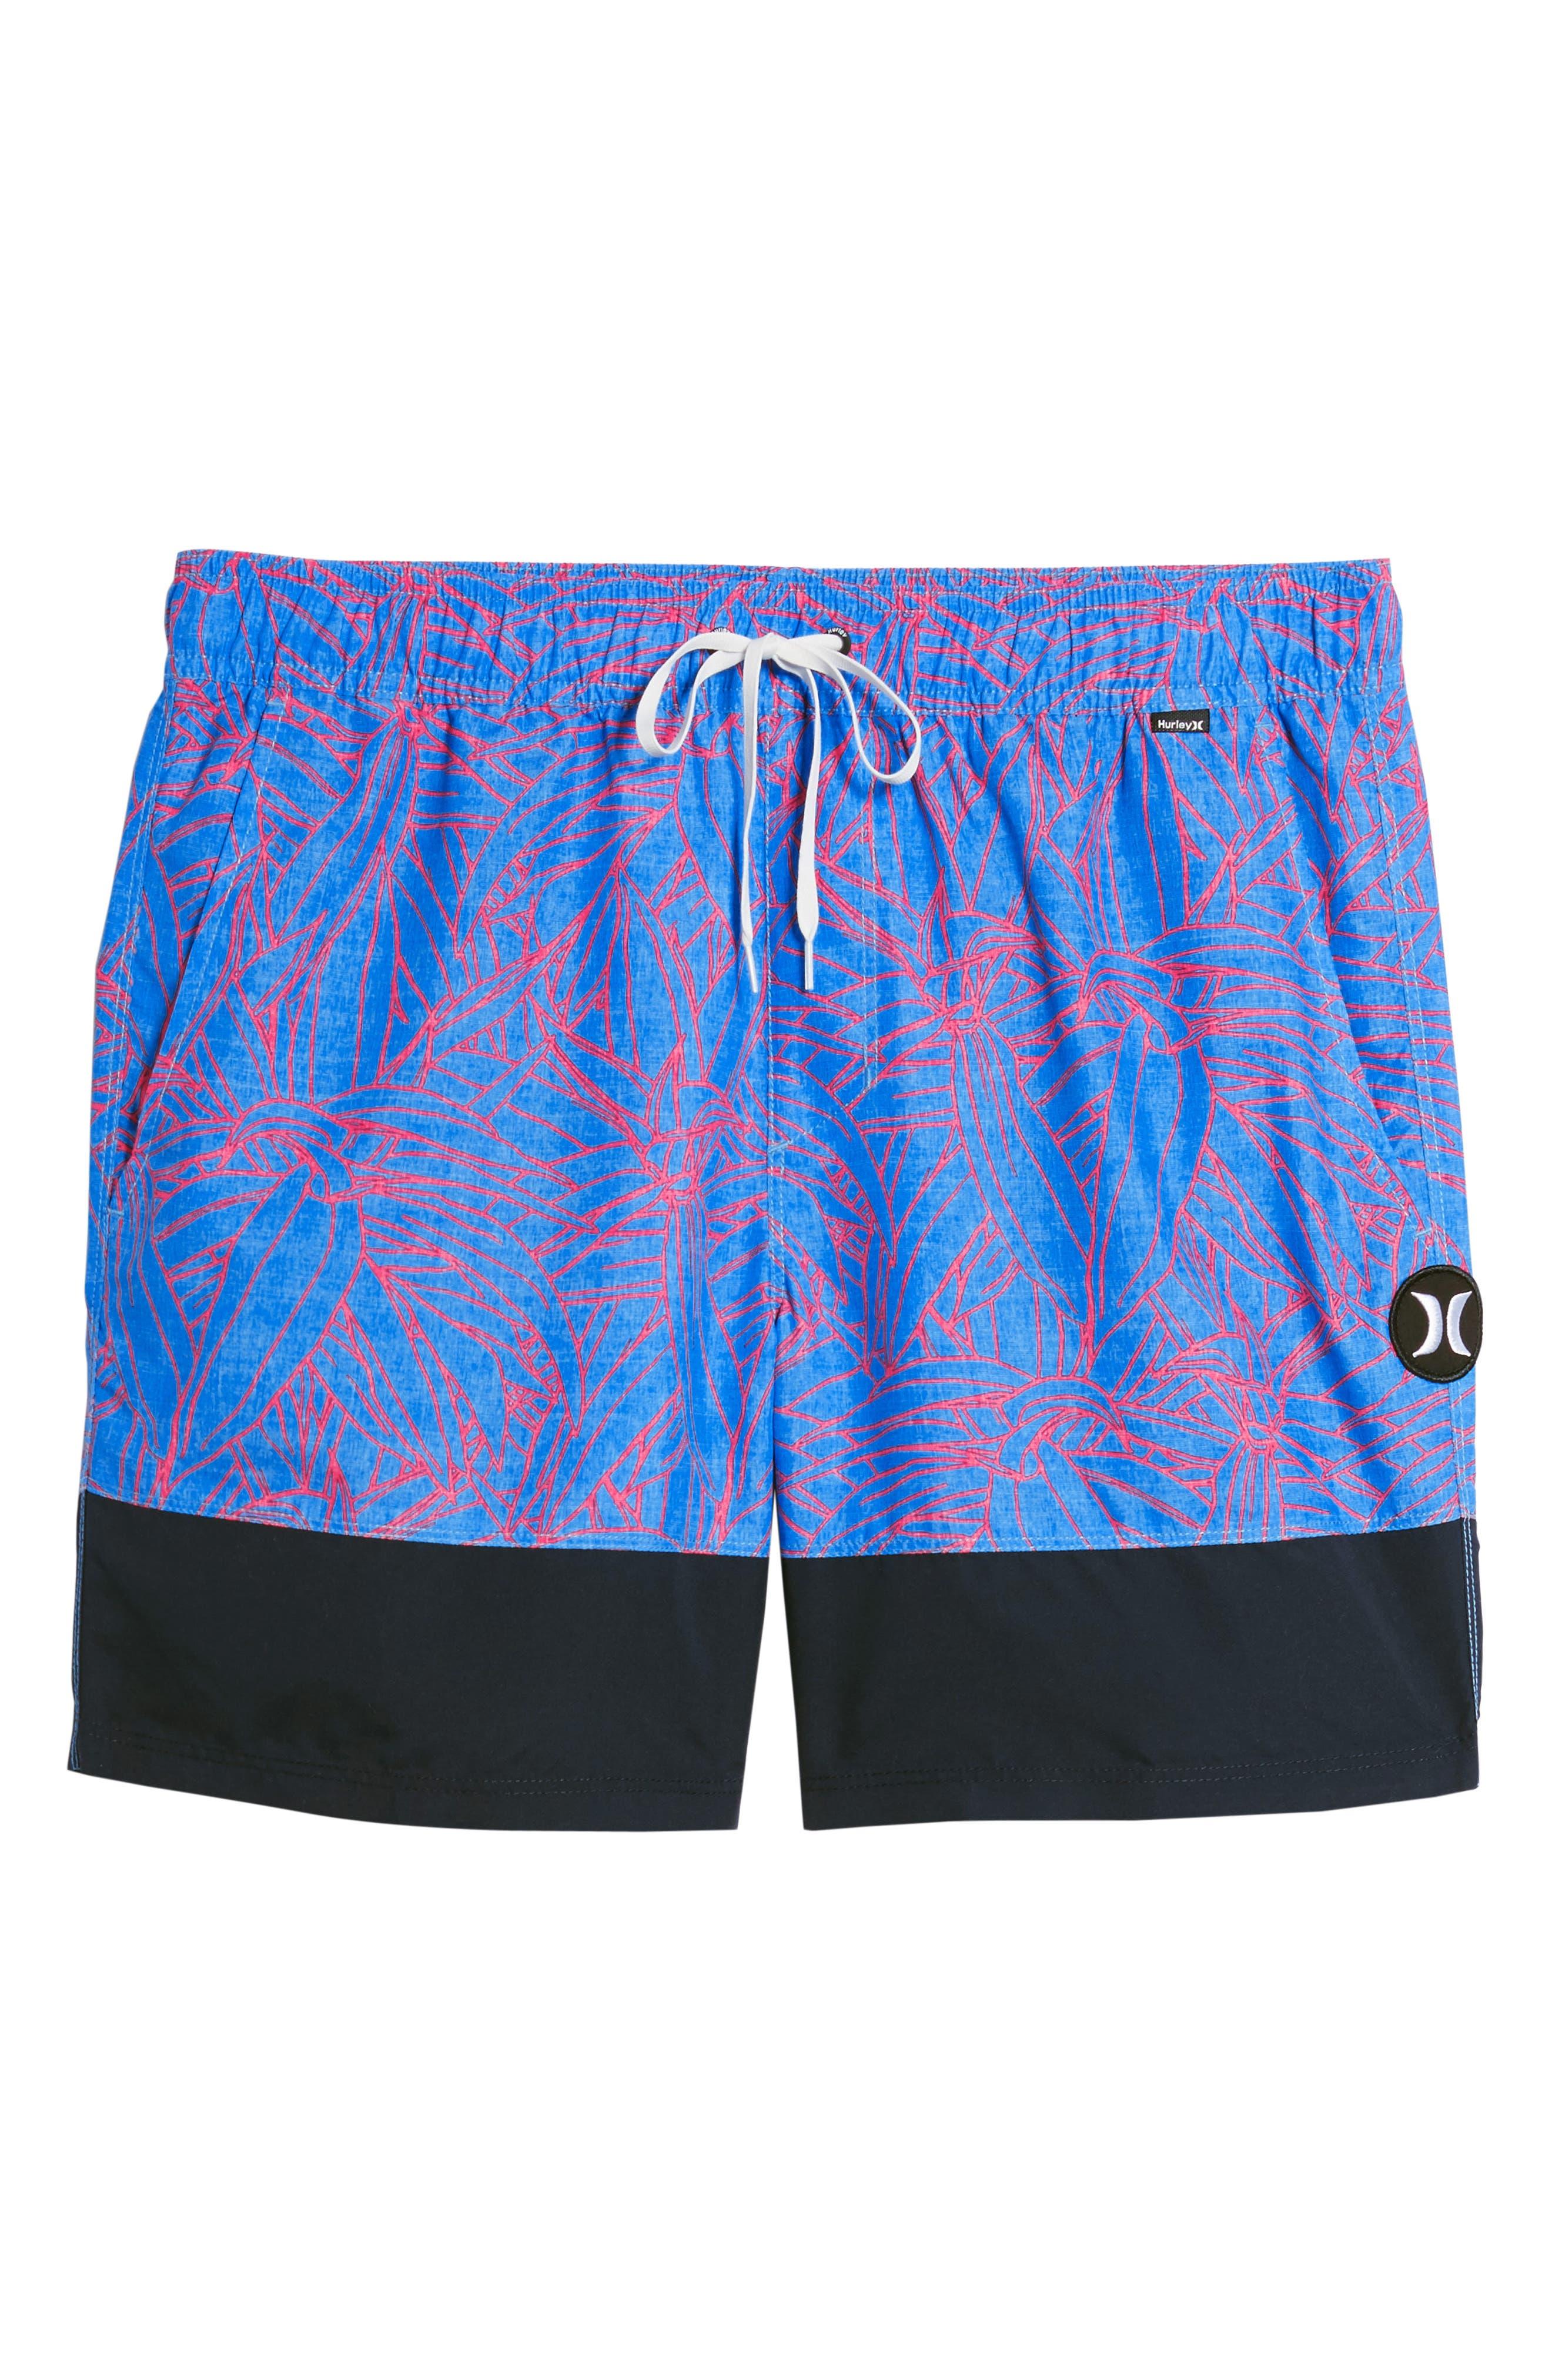 Pupkea Volley Board Shorts,                             Alternate thumbnail 12, color,